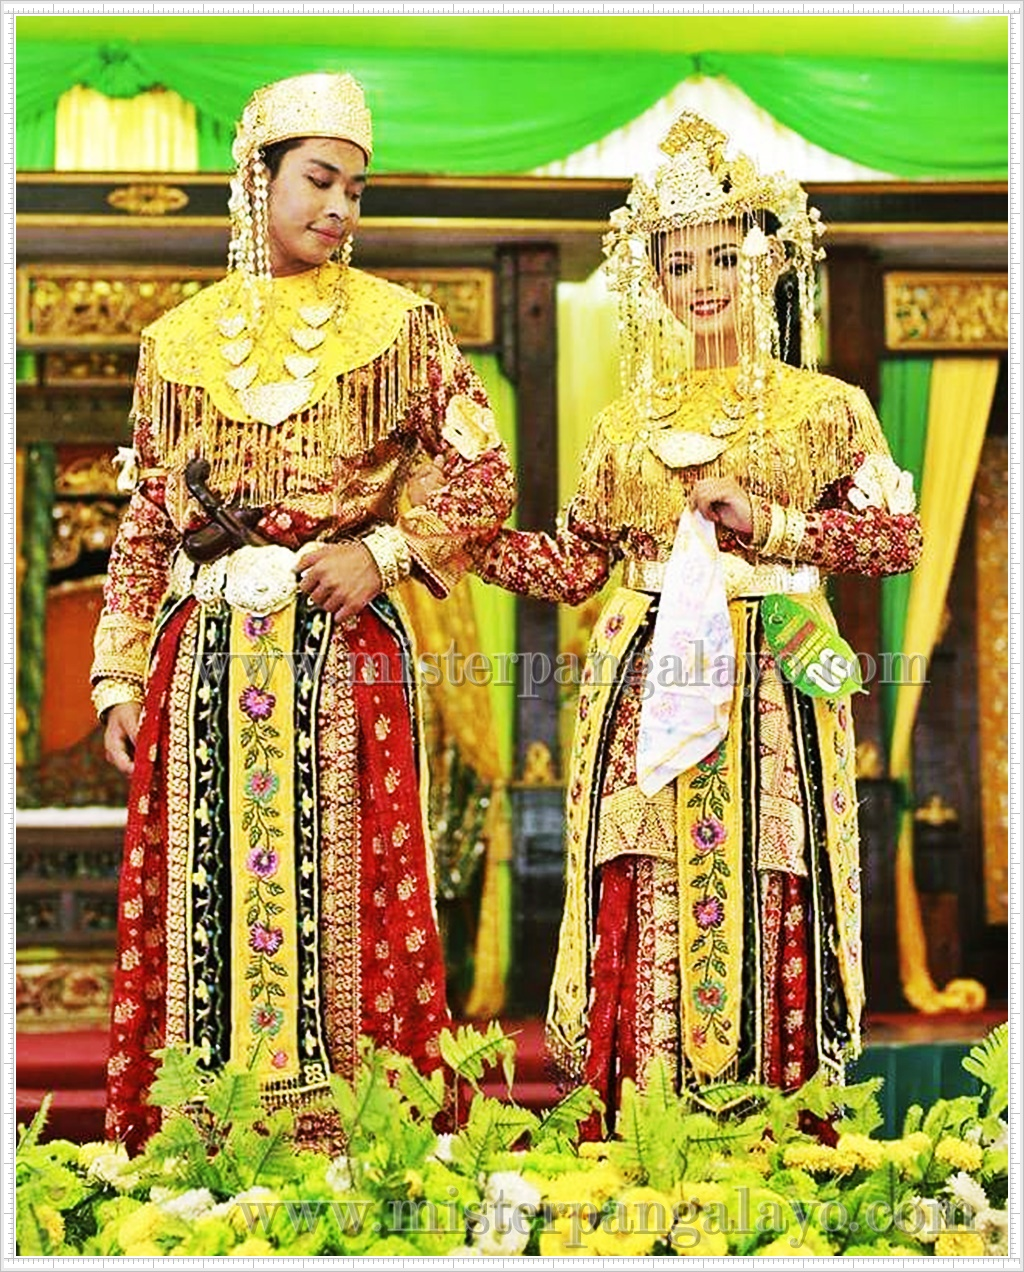 9 Gambar Baju Pernikahan Adat Melayu Kalimantan Barat Kekinian